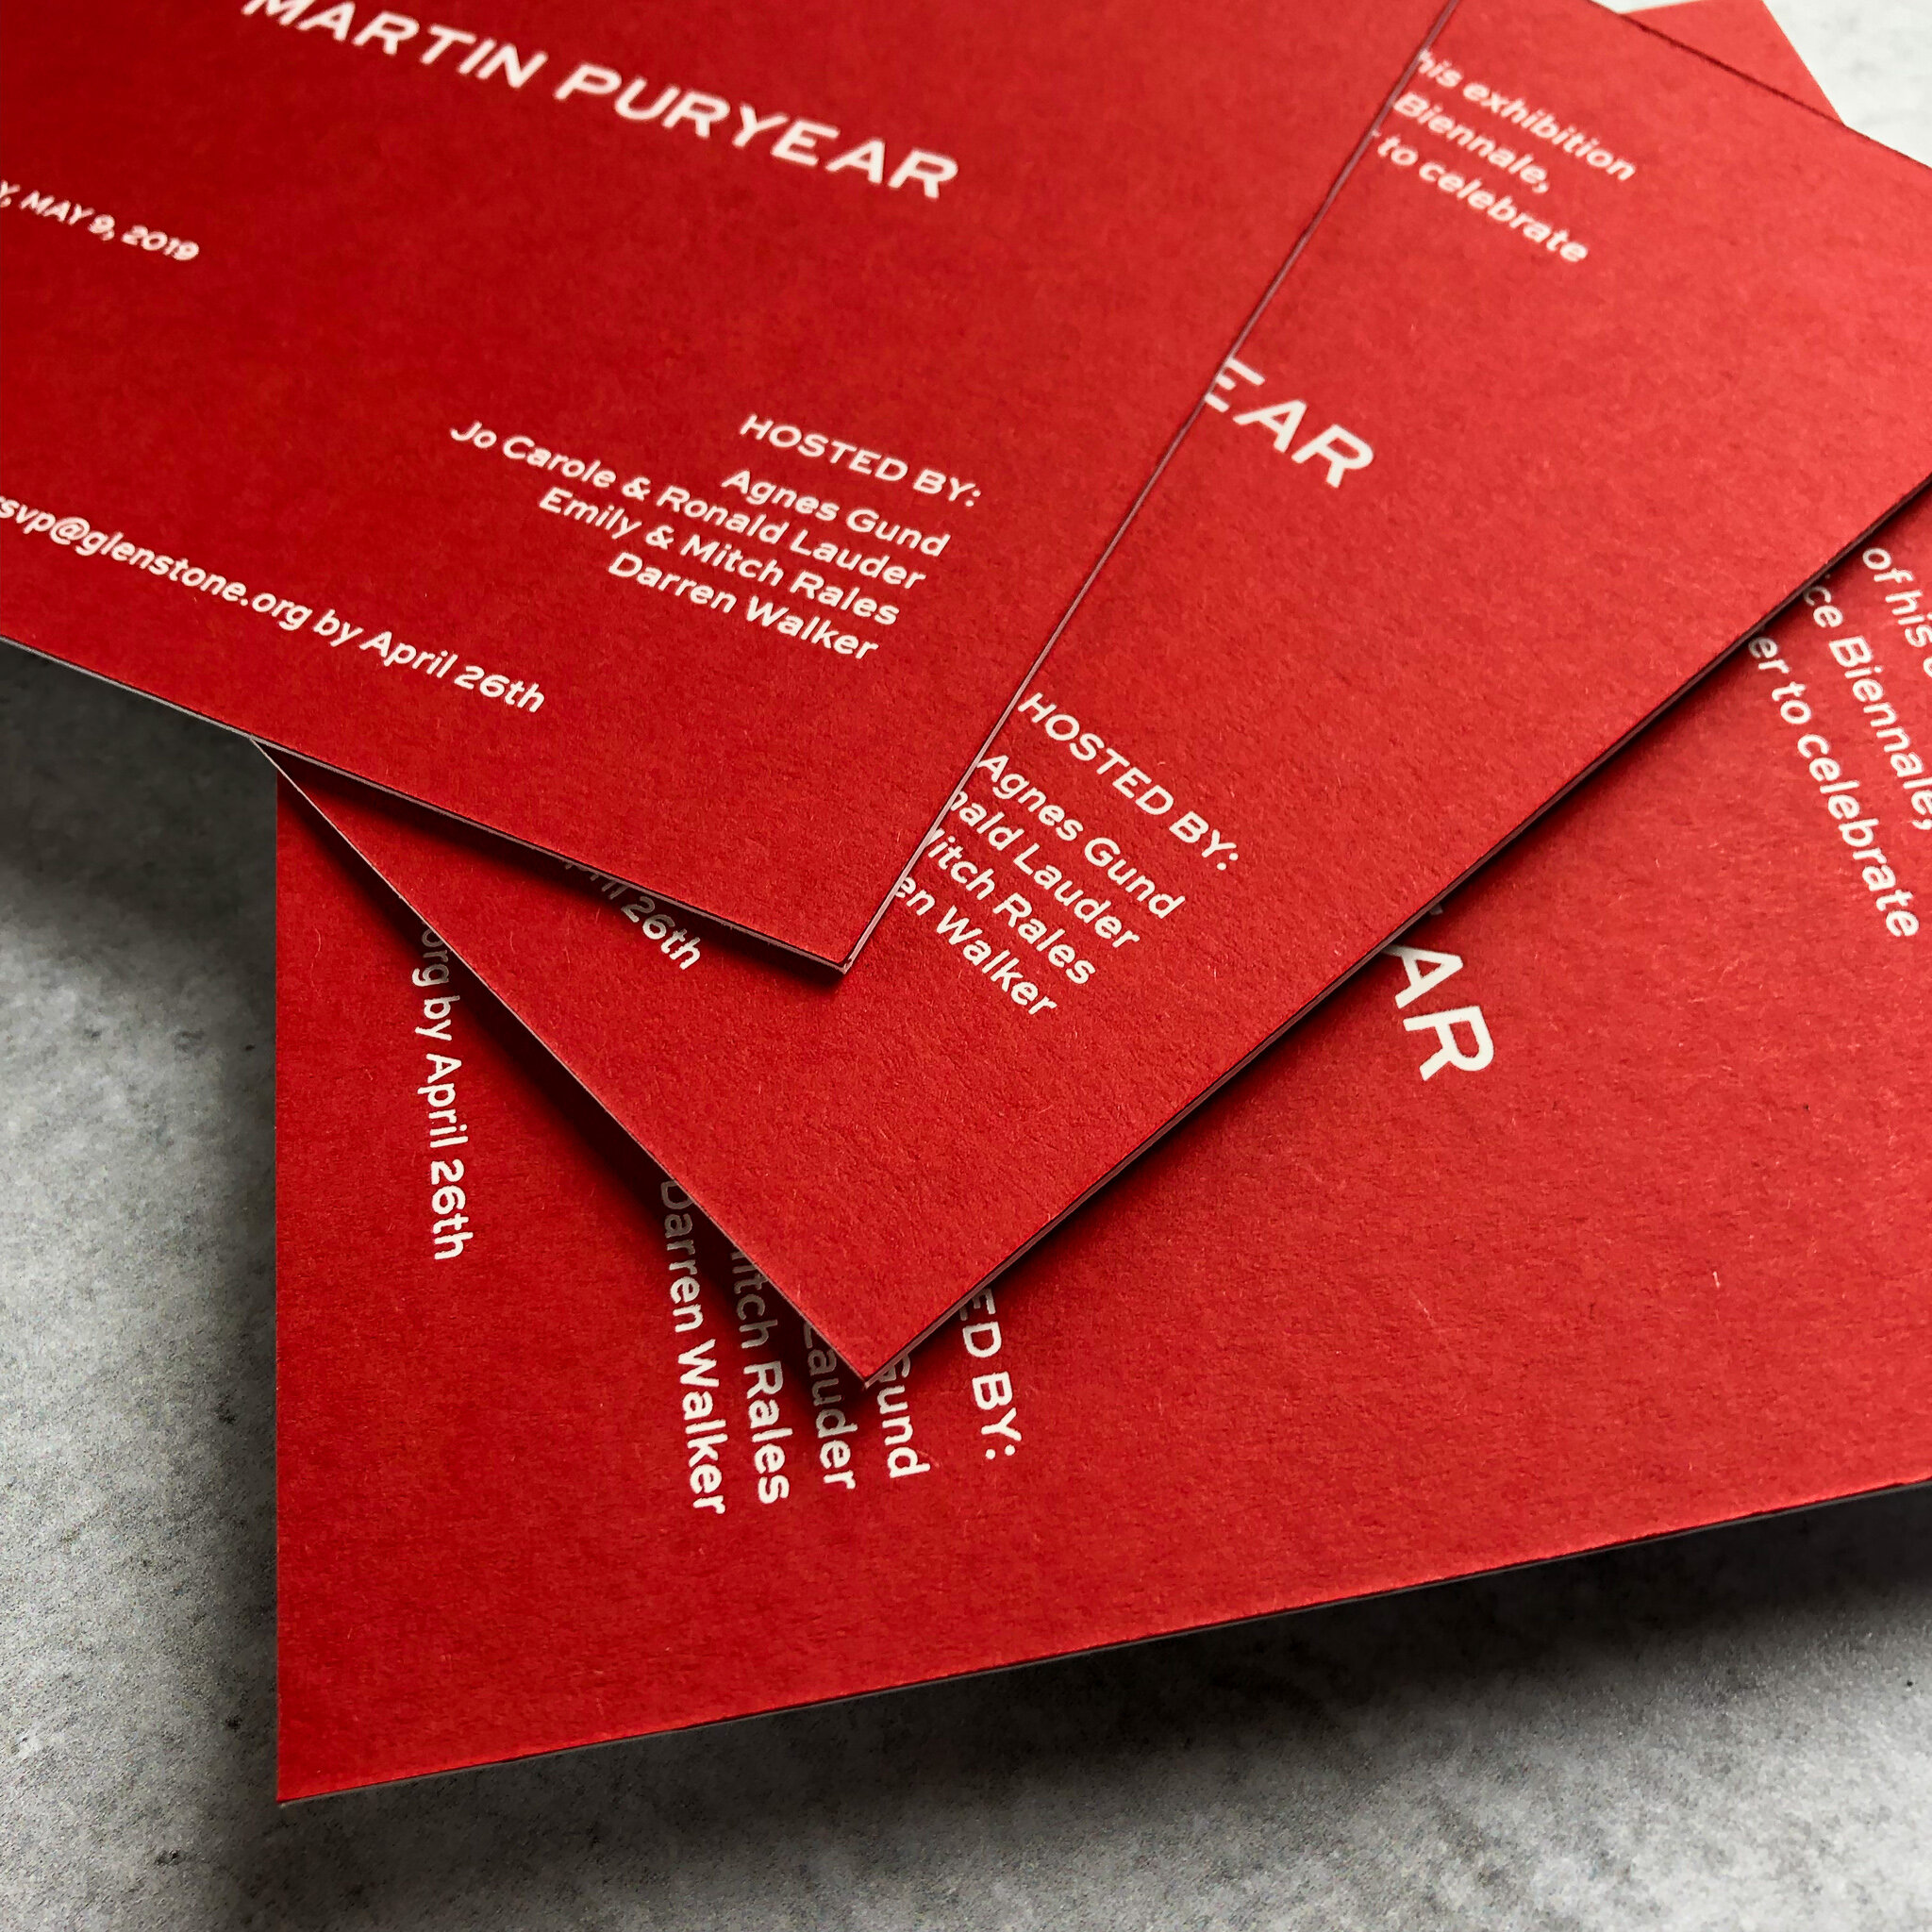 TypeAInvitations_CelebratingMartinPuryear_HostedByGlenstone_PartyInvitation-WhiteFoilPrinting_spread-detail.jpg